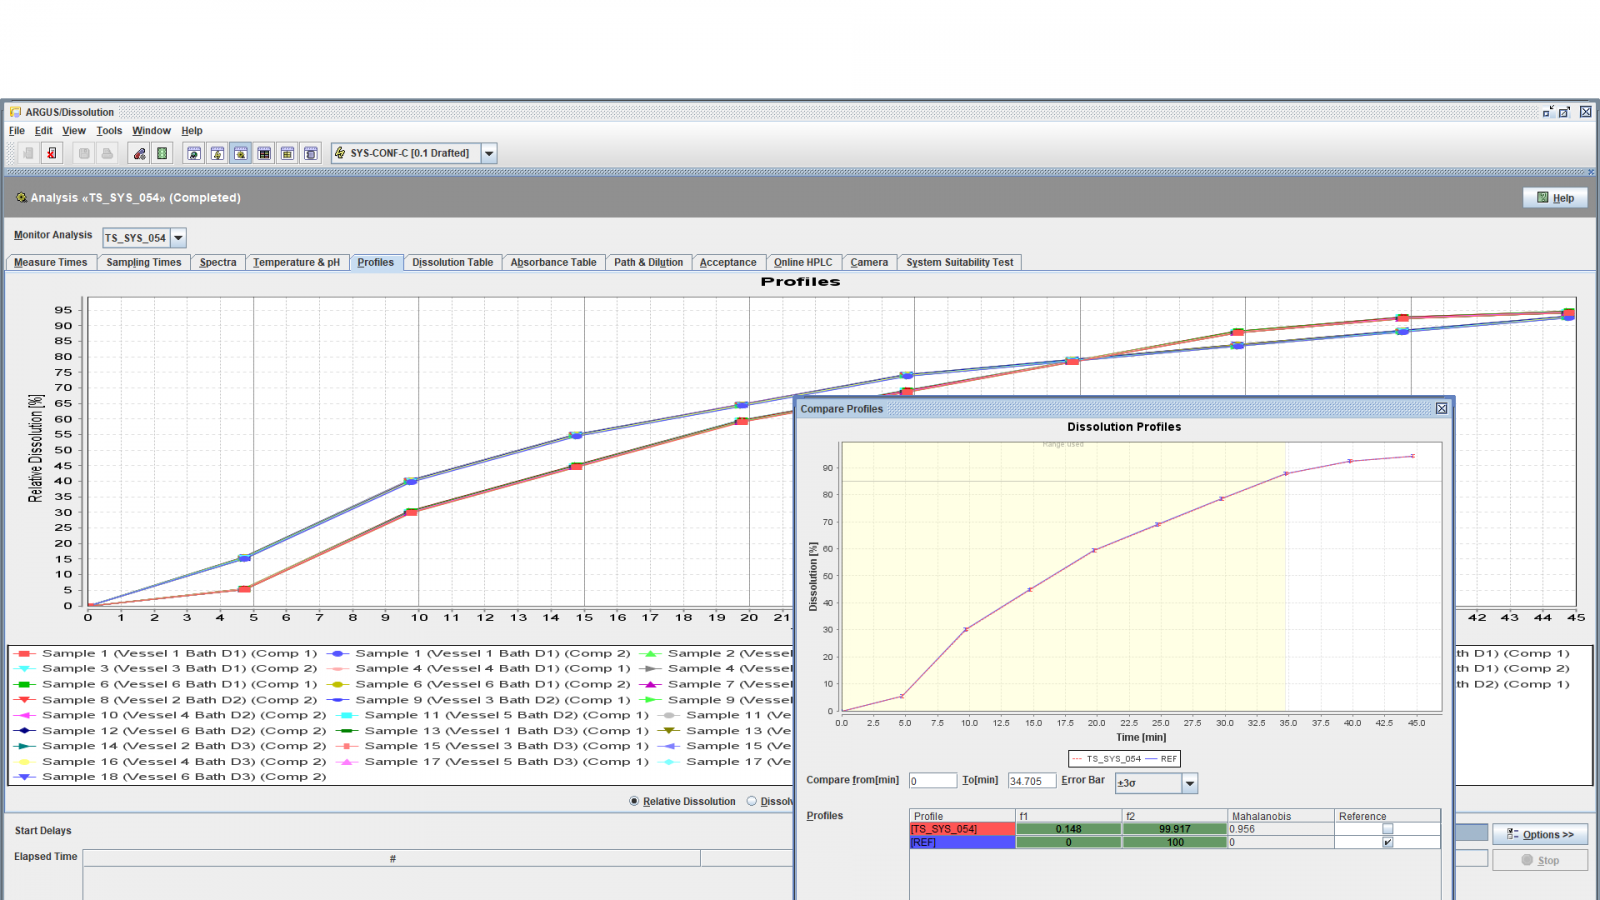 Example Dissolution Profile Analysis